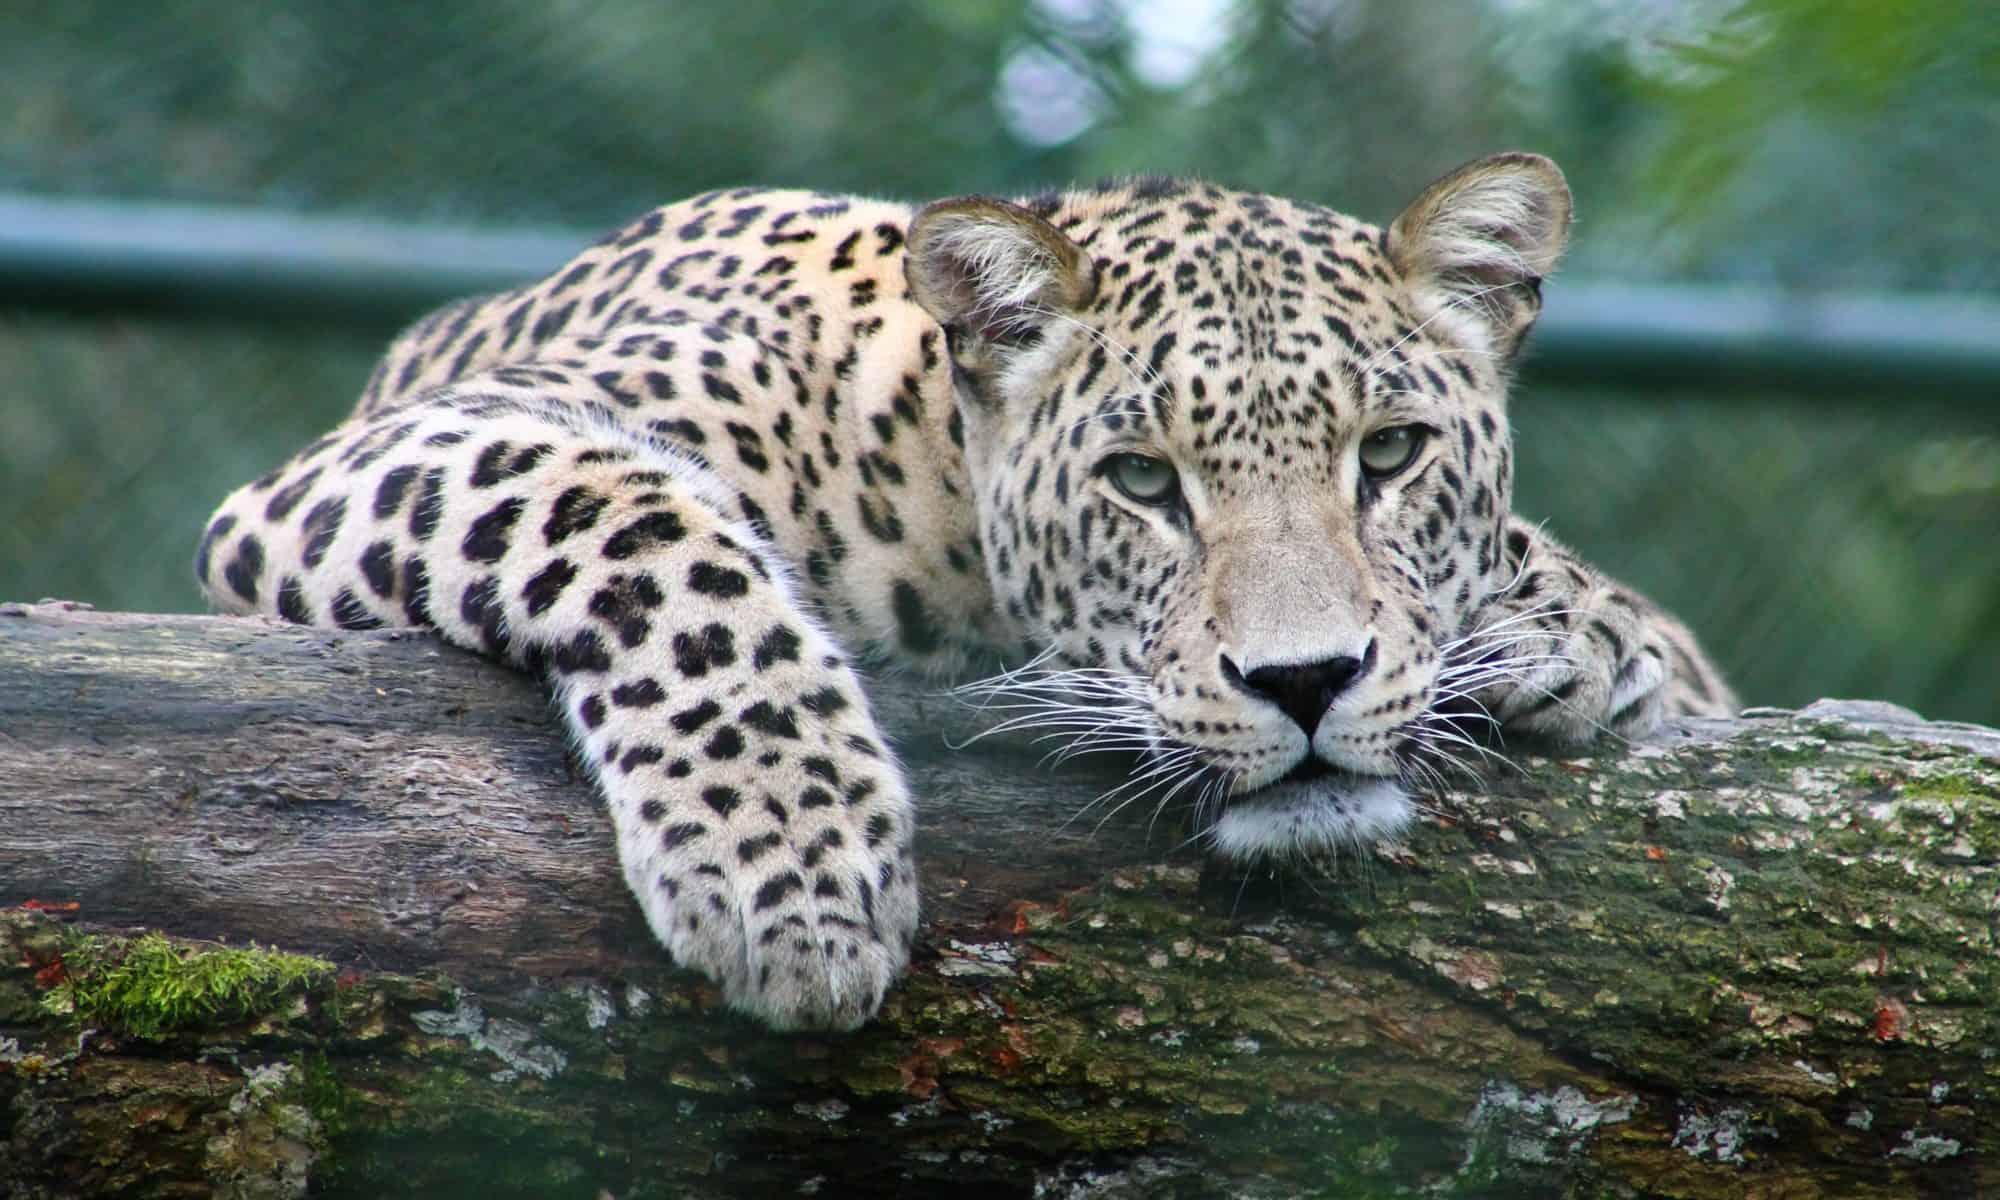 a leopard on a tree branch